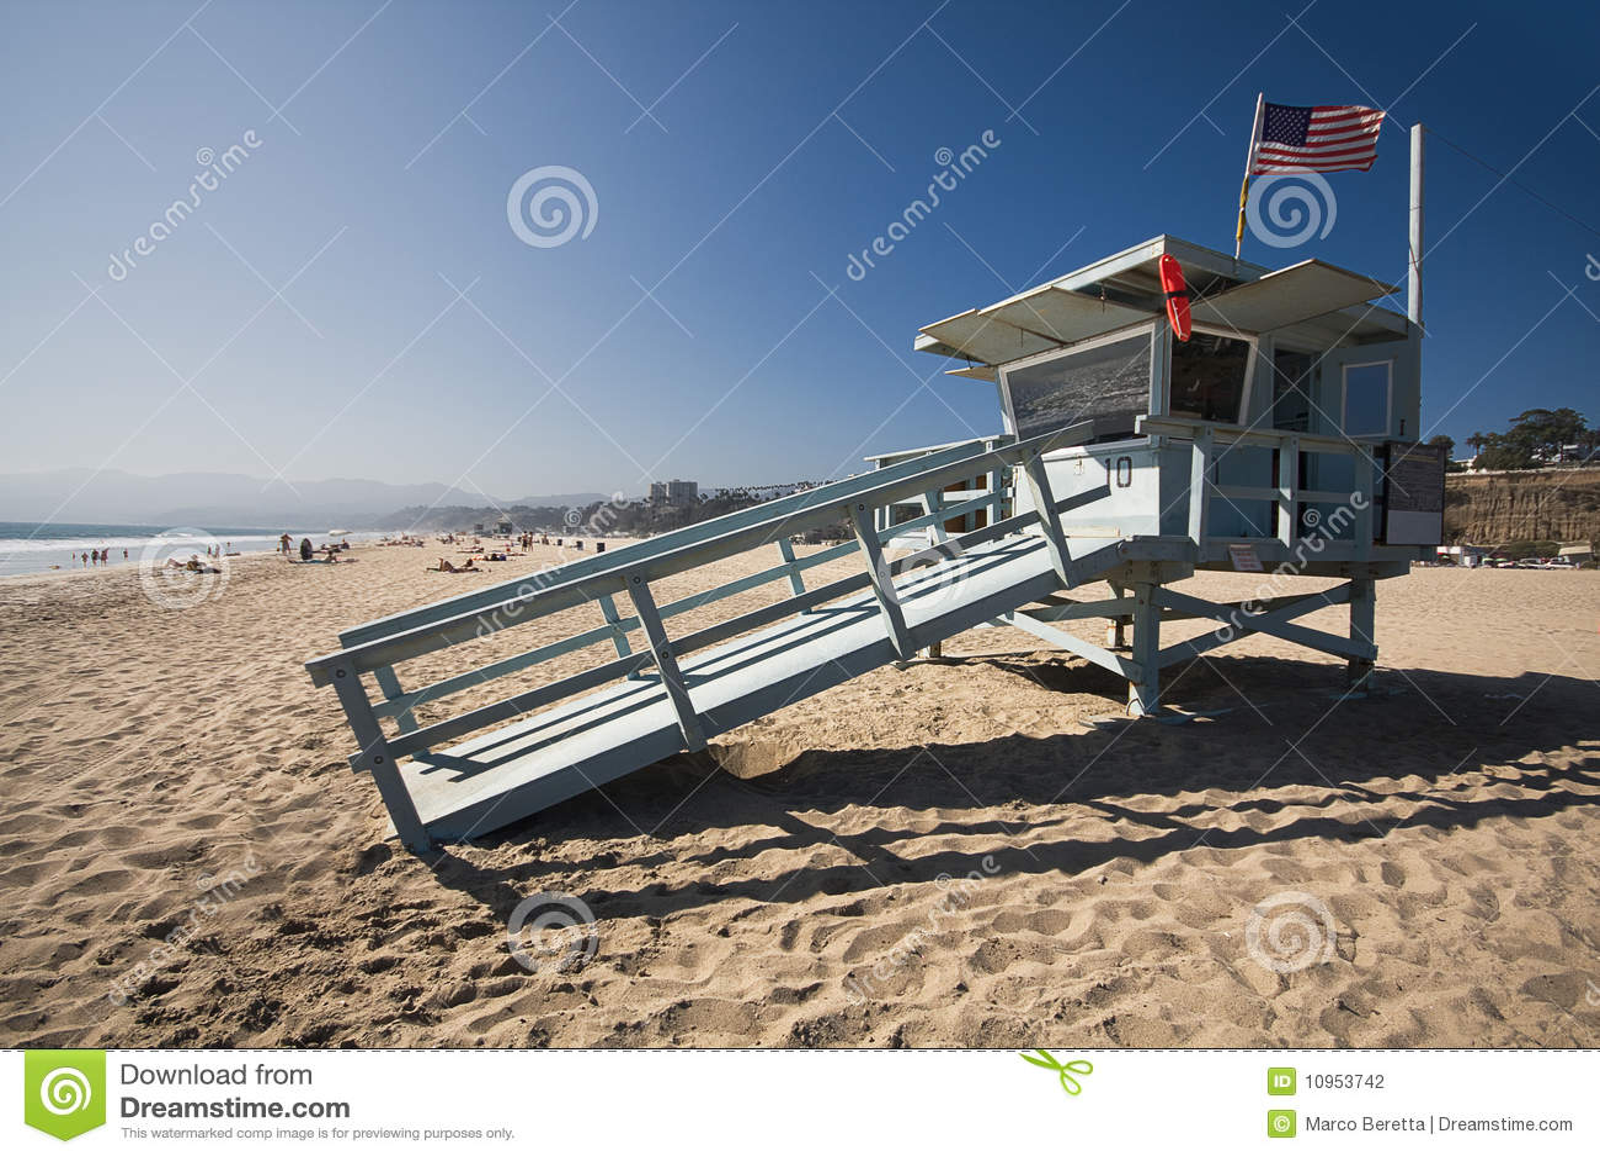 Life Guard House On The Santa Monica Beach Stock Photo